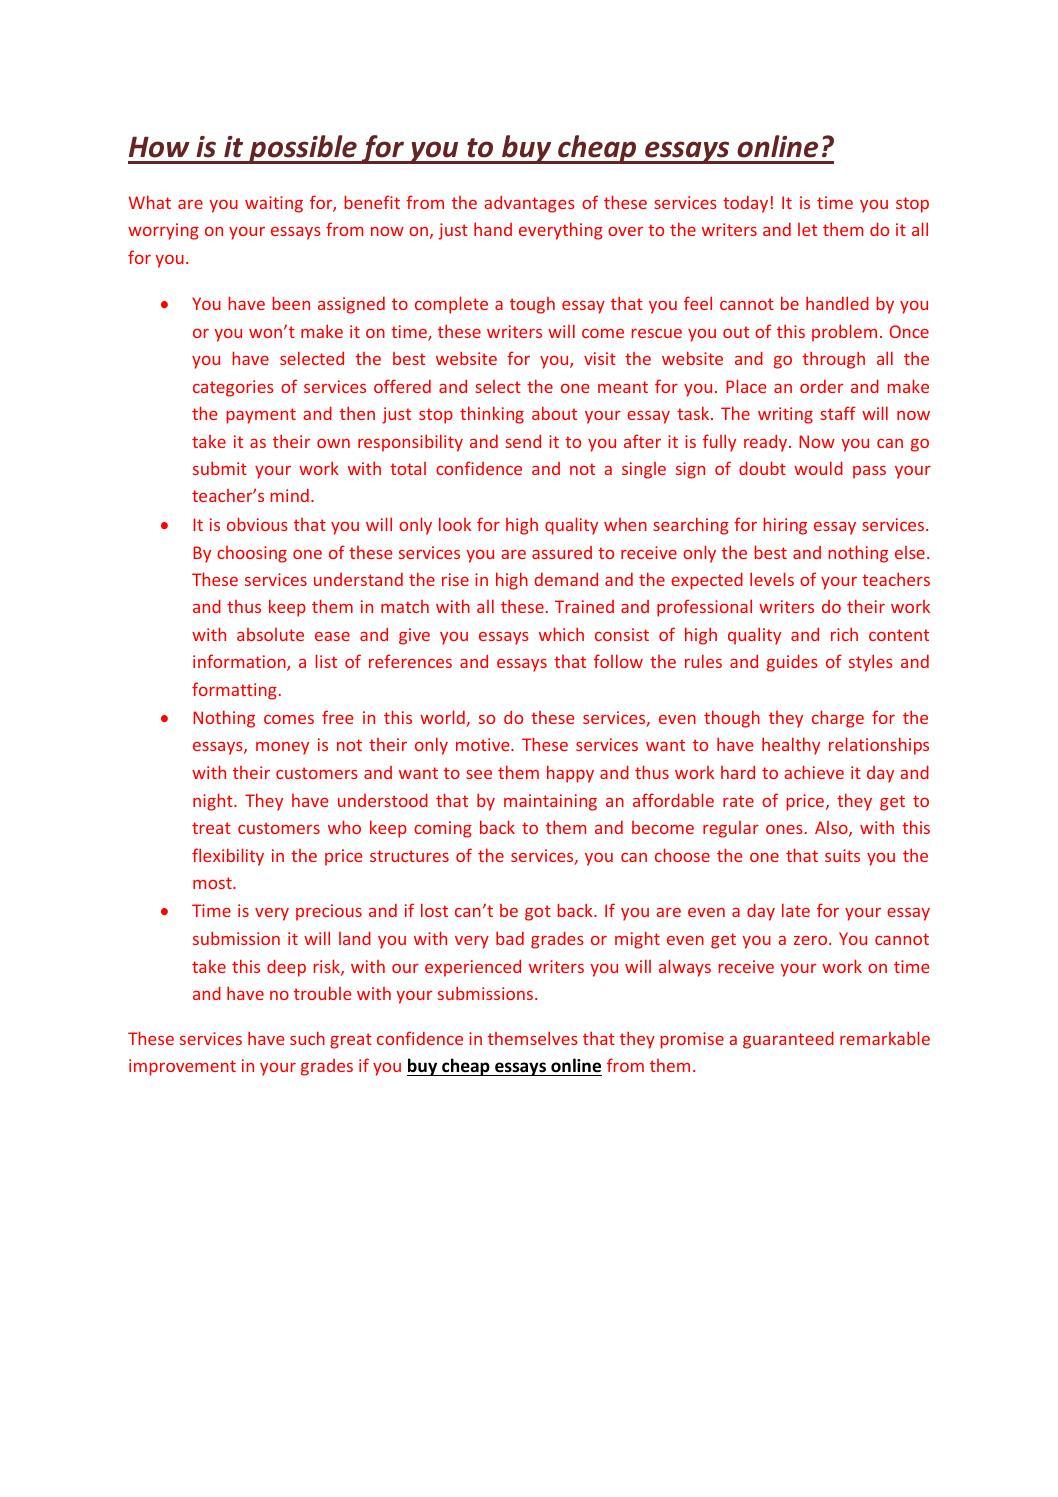 cheap essay writing 24